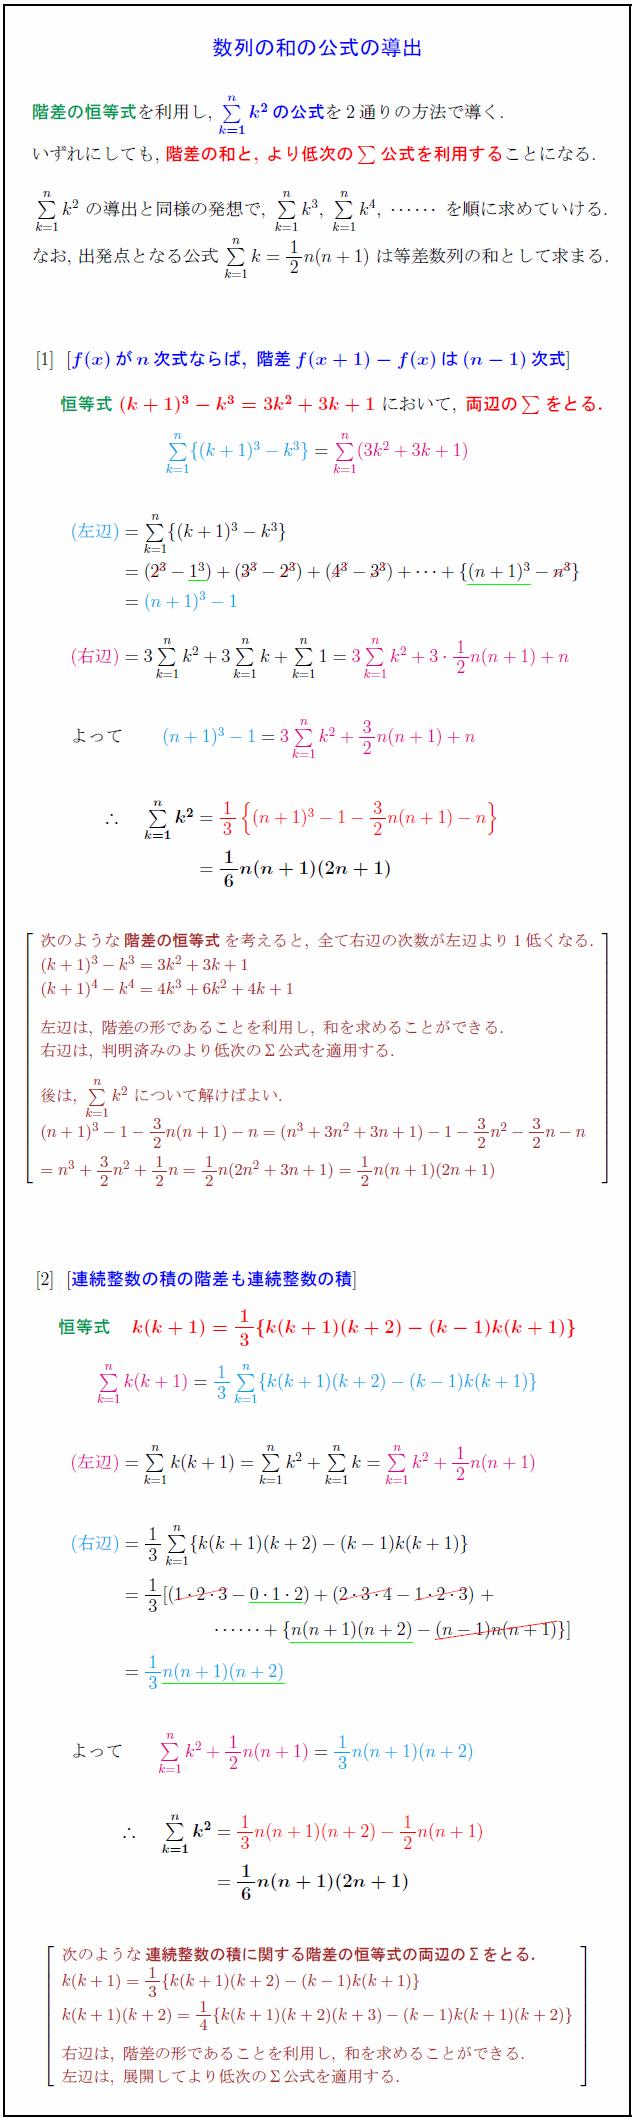 sigma-formula-derivation